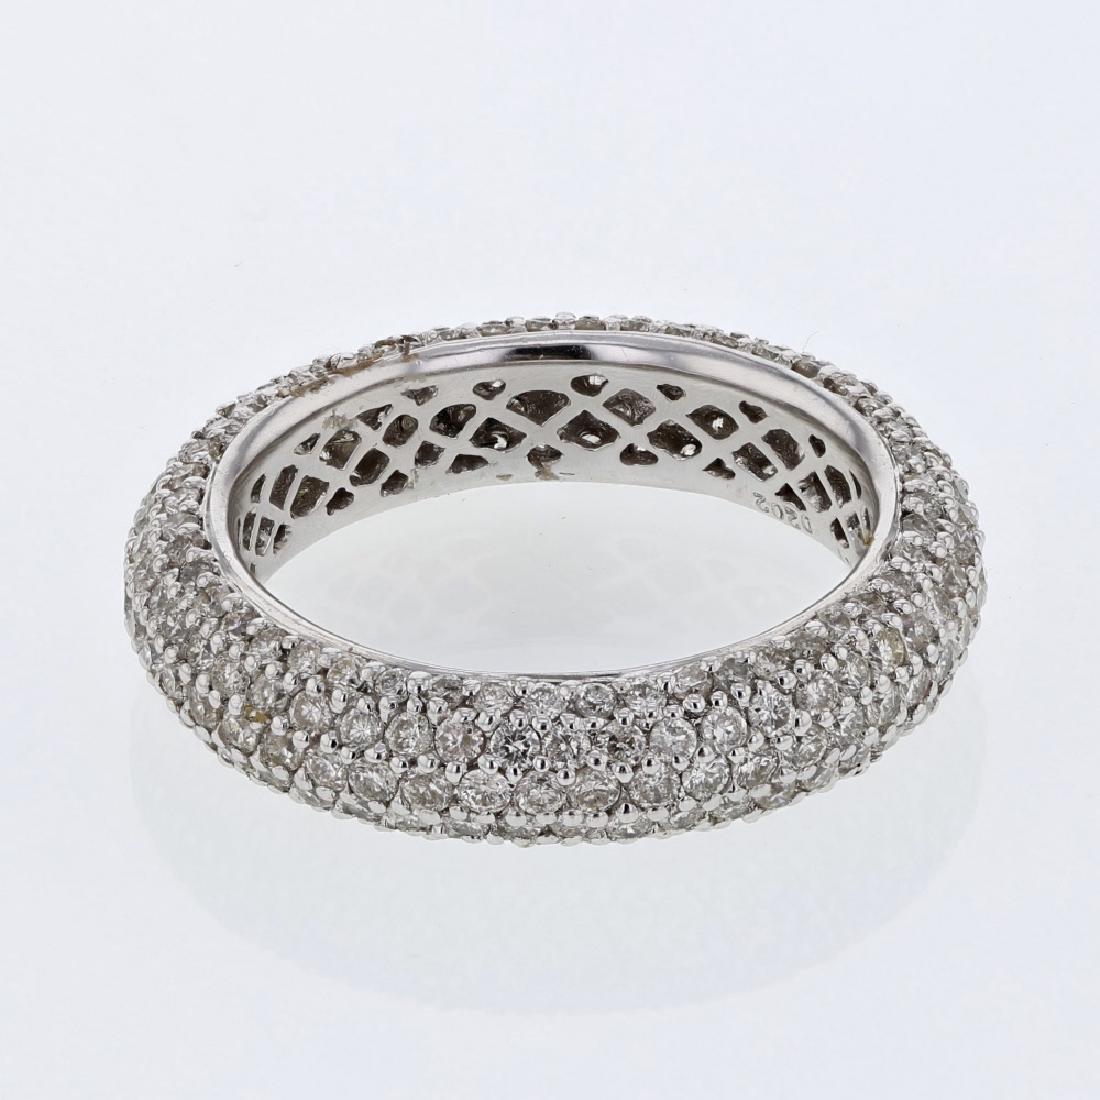 2.02 CTW Diamond Wedding Band Ring 14K White Gold